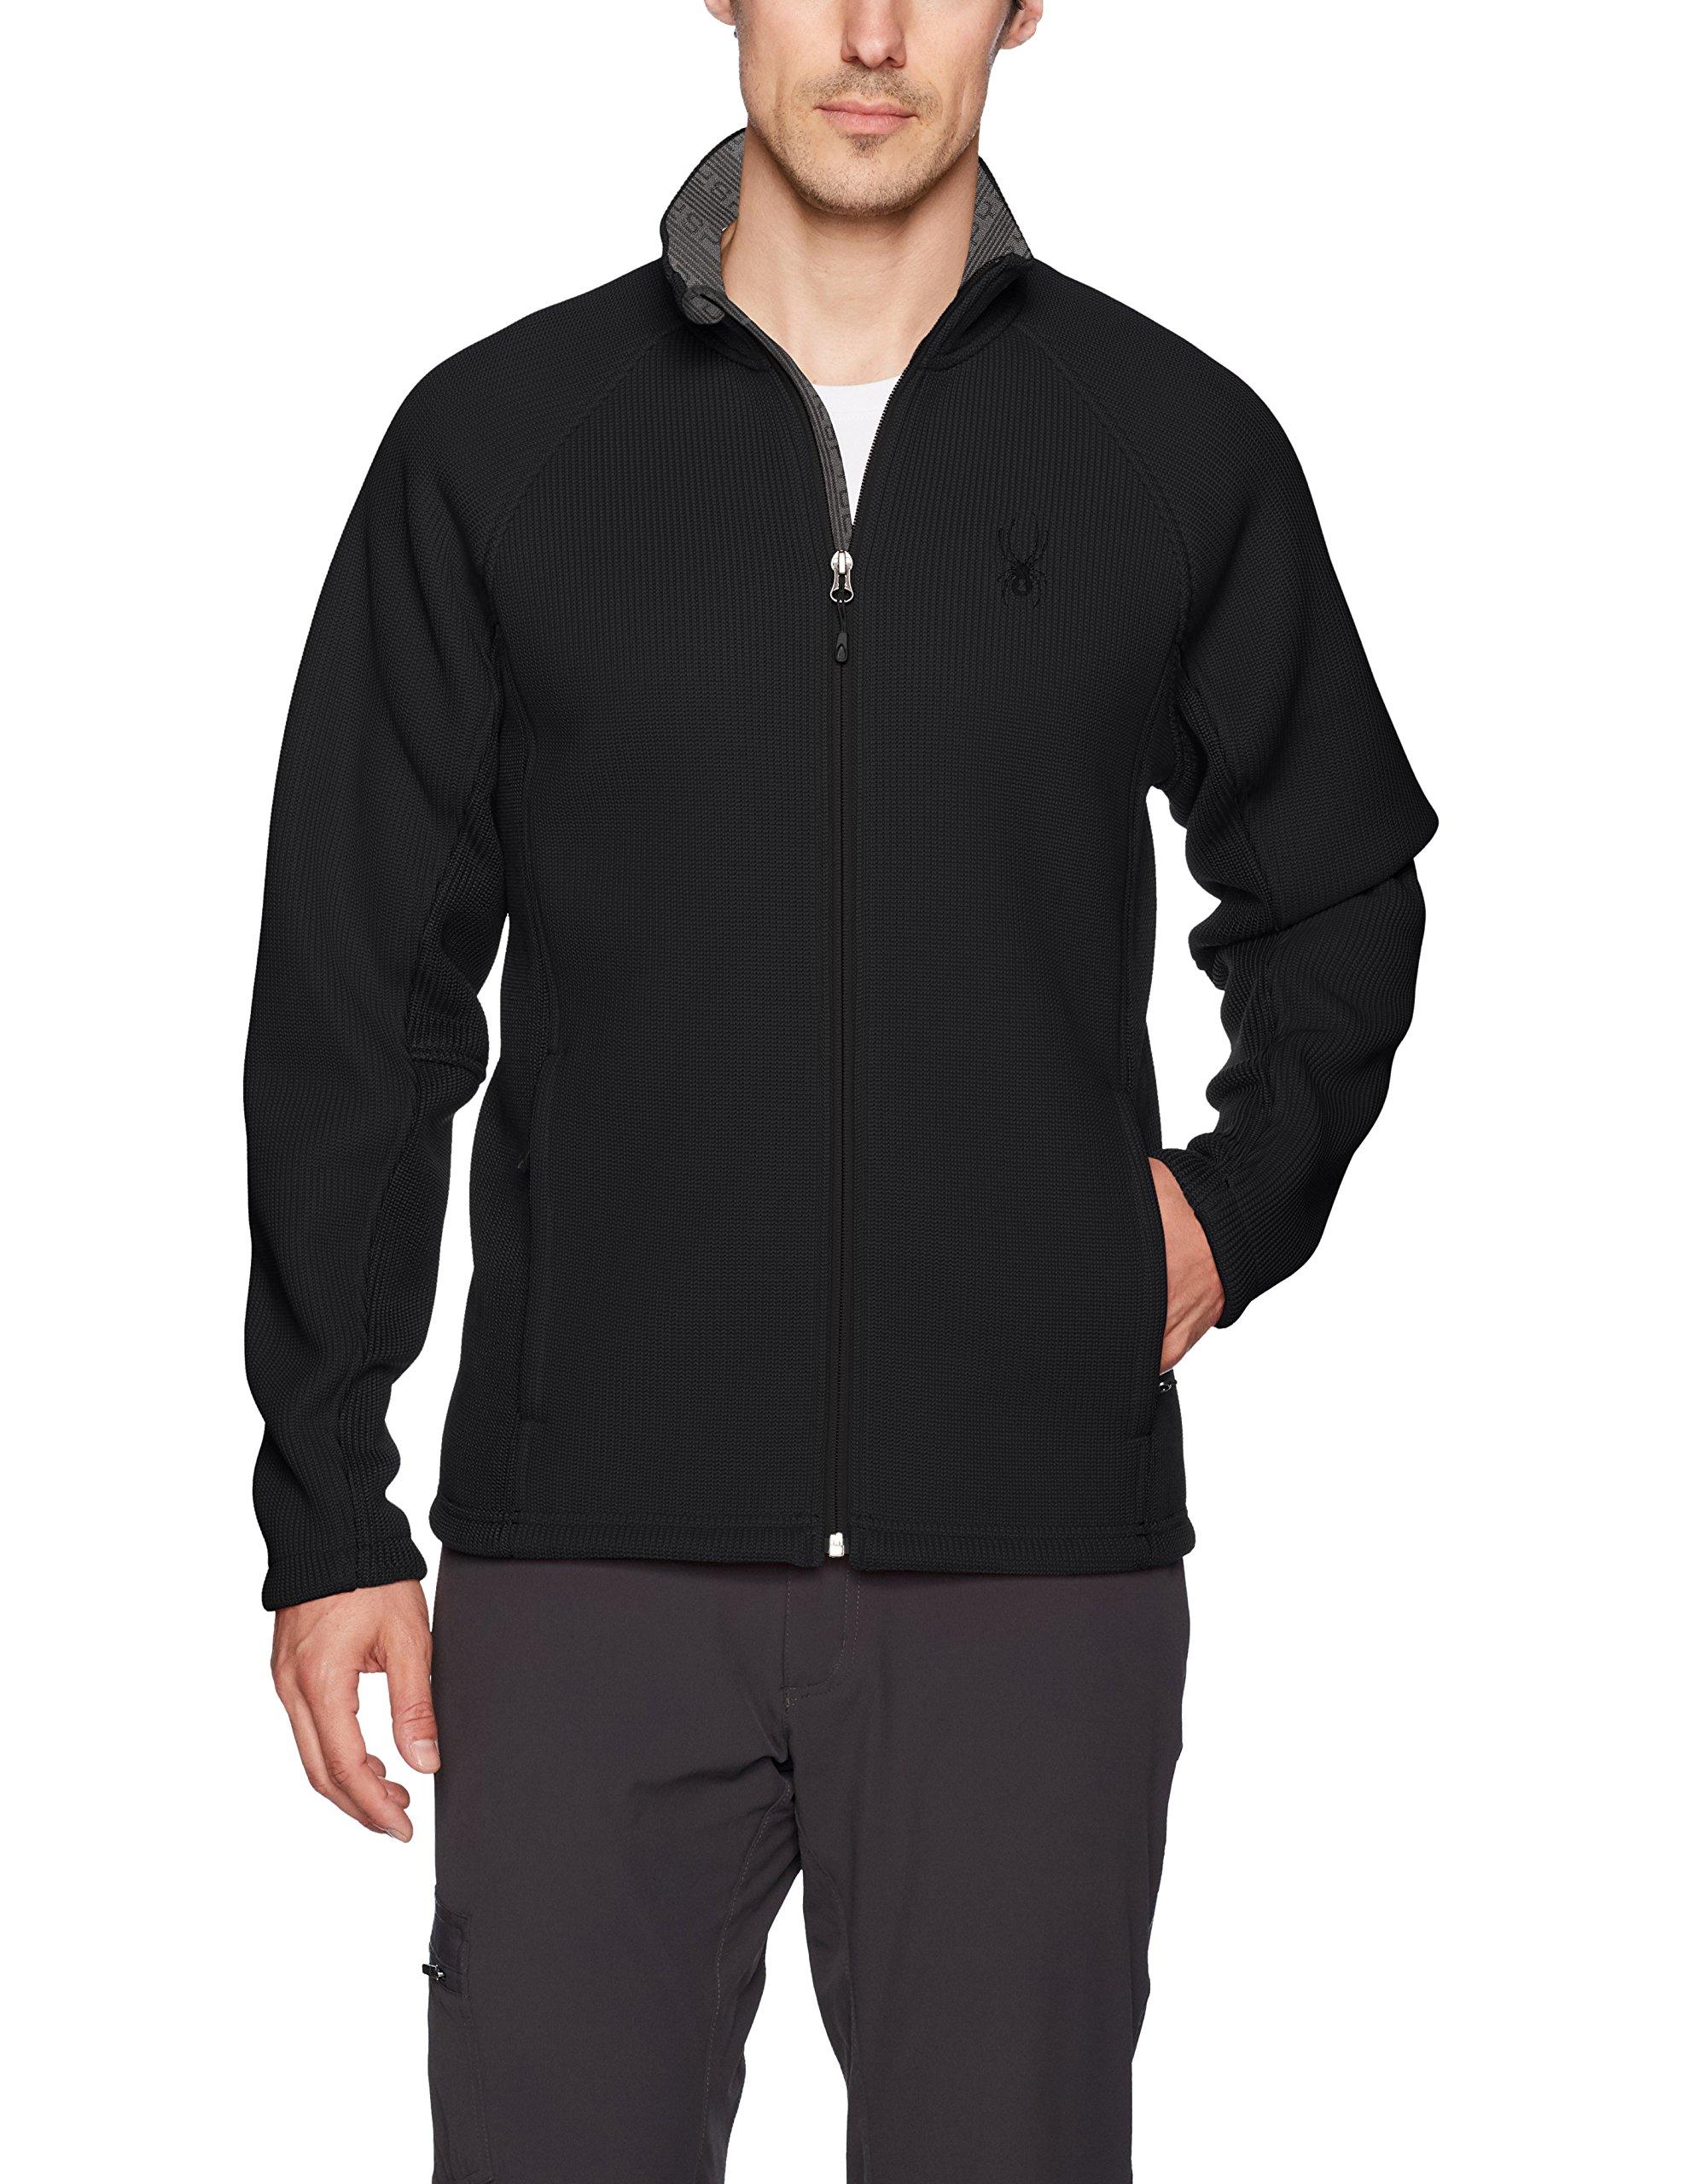 Spyder Men's Foremost Full Zip Heavy Wt Stryke Jacket, Black/Black, X-Large